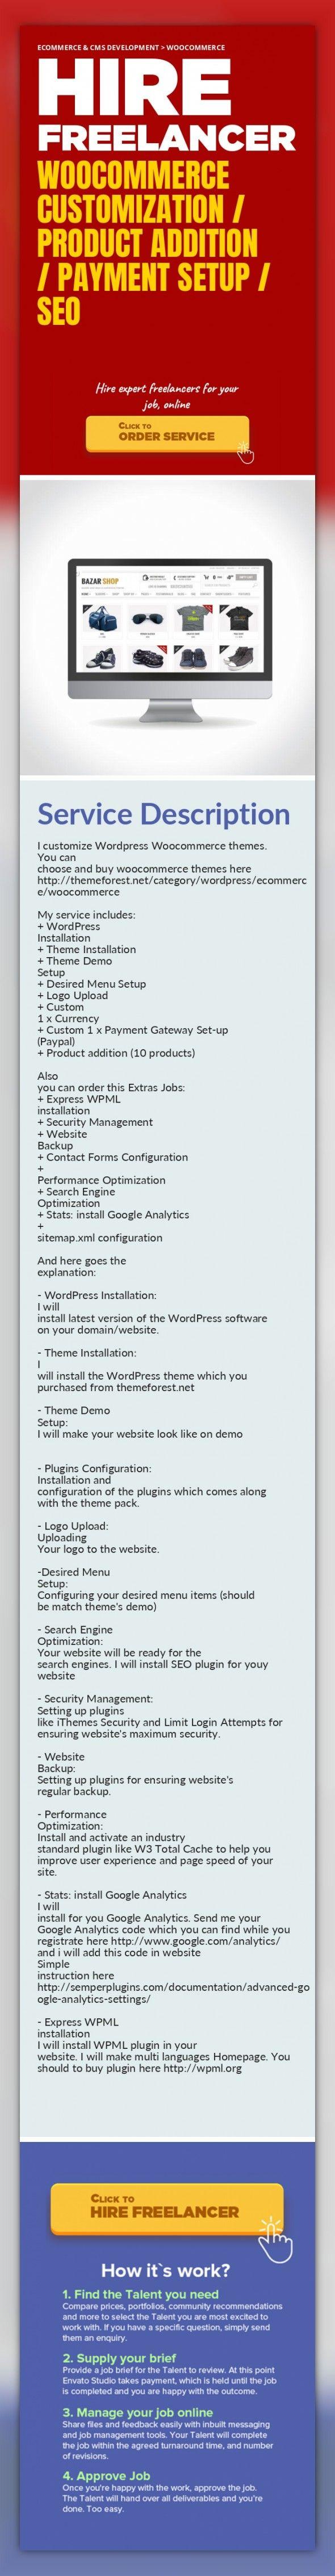 WooCommerce Customization / Product Addition / Payment Setup / SEO Ecommerce & CMS Development, WooCommerce   I customize Wordpress Woocommerce themes.  You can choose and buy woocommerce themes here http://themeforest.net/category/wordpress/ecommerce/woocommerce    My service includes:  + WordPress Installation  + Theme Installation  + Theme Demo Setup  + Desired Menu Setup  + Logo Upload  + Cust...